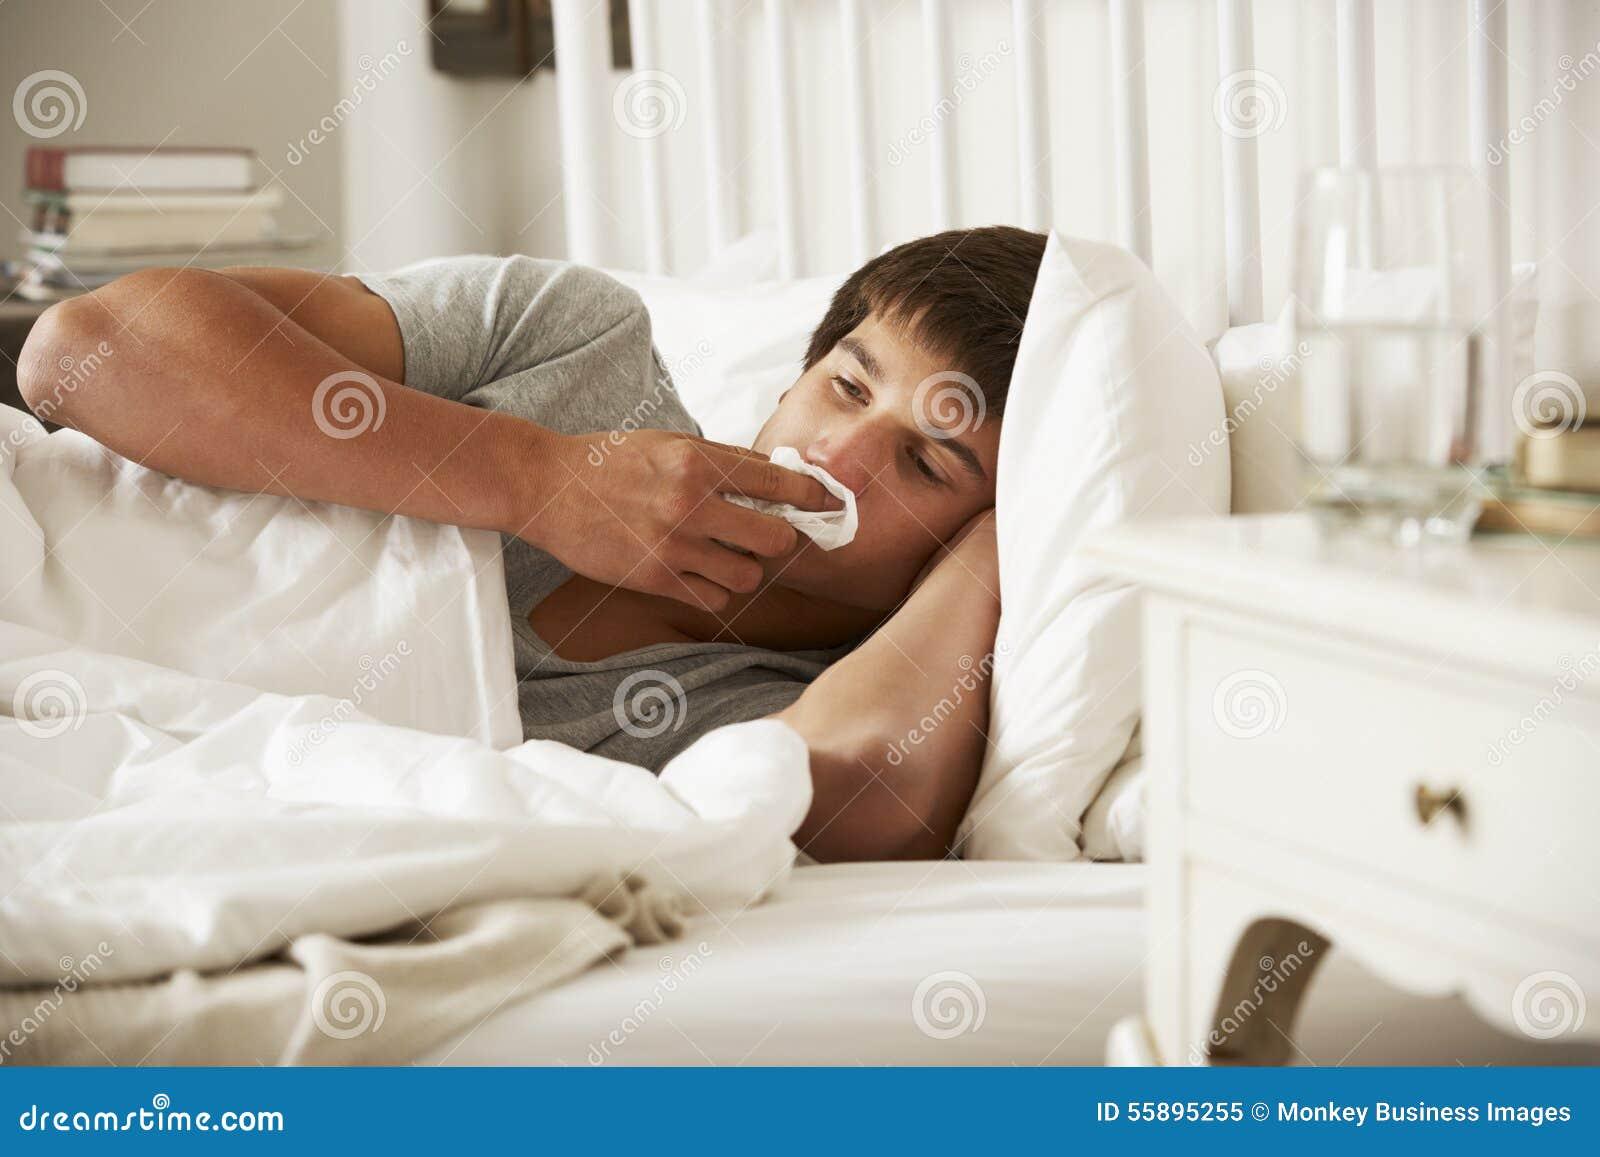 Eitelkeit Bett Teenager Beste Wahl Pattern Kranker Im Zu E Stockbild -